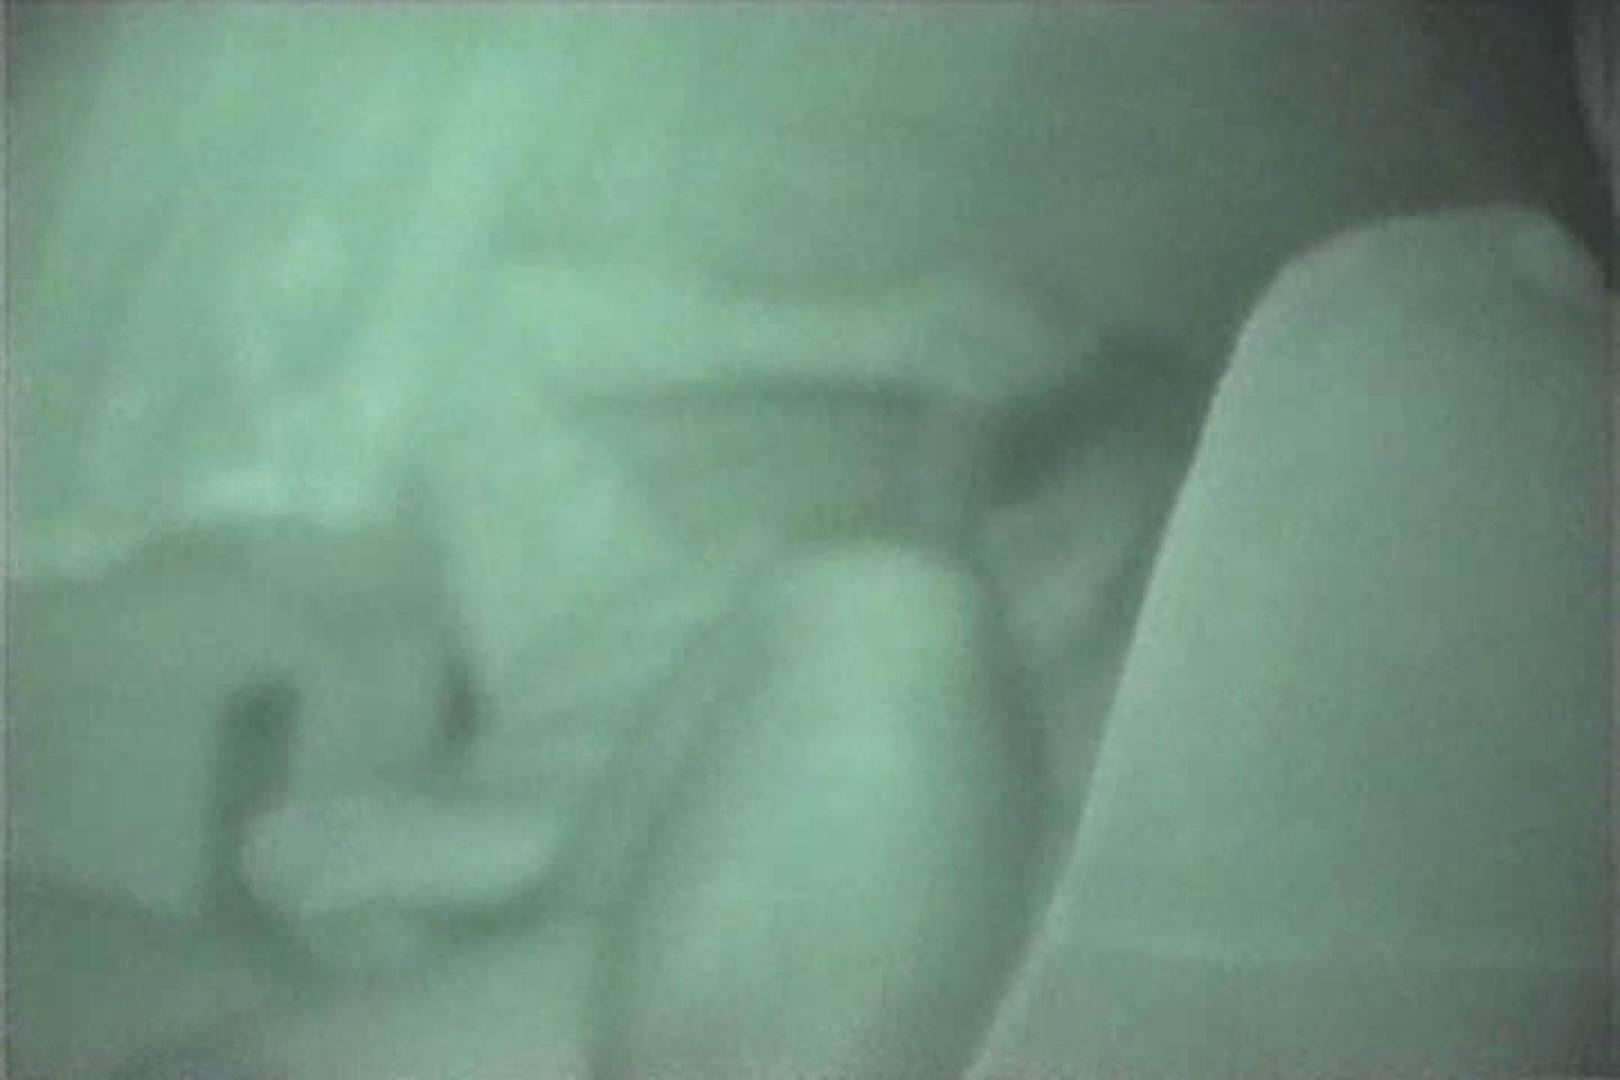 MASAさんの待ち伏せ撮り! 赤外線カーセックスVol.18 カーセックス AV無料動画キャプチャ 64PICs 34